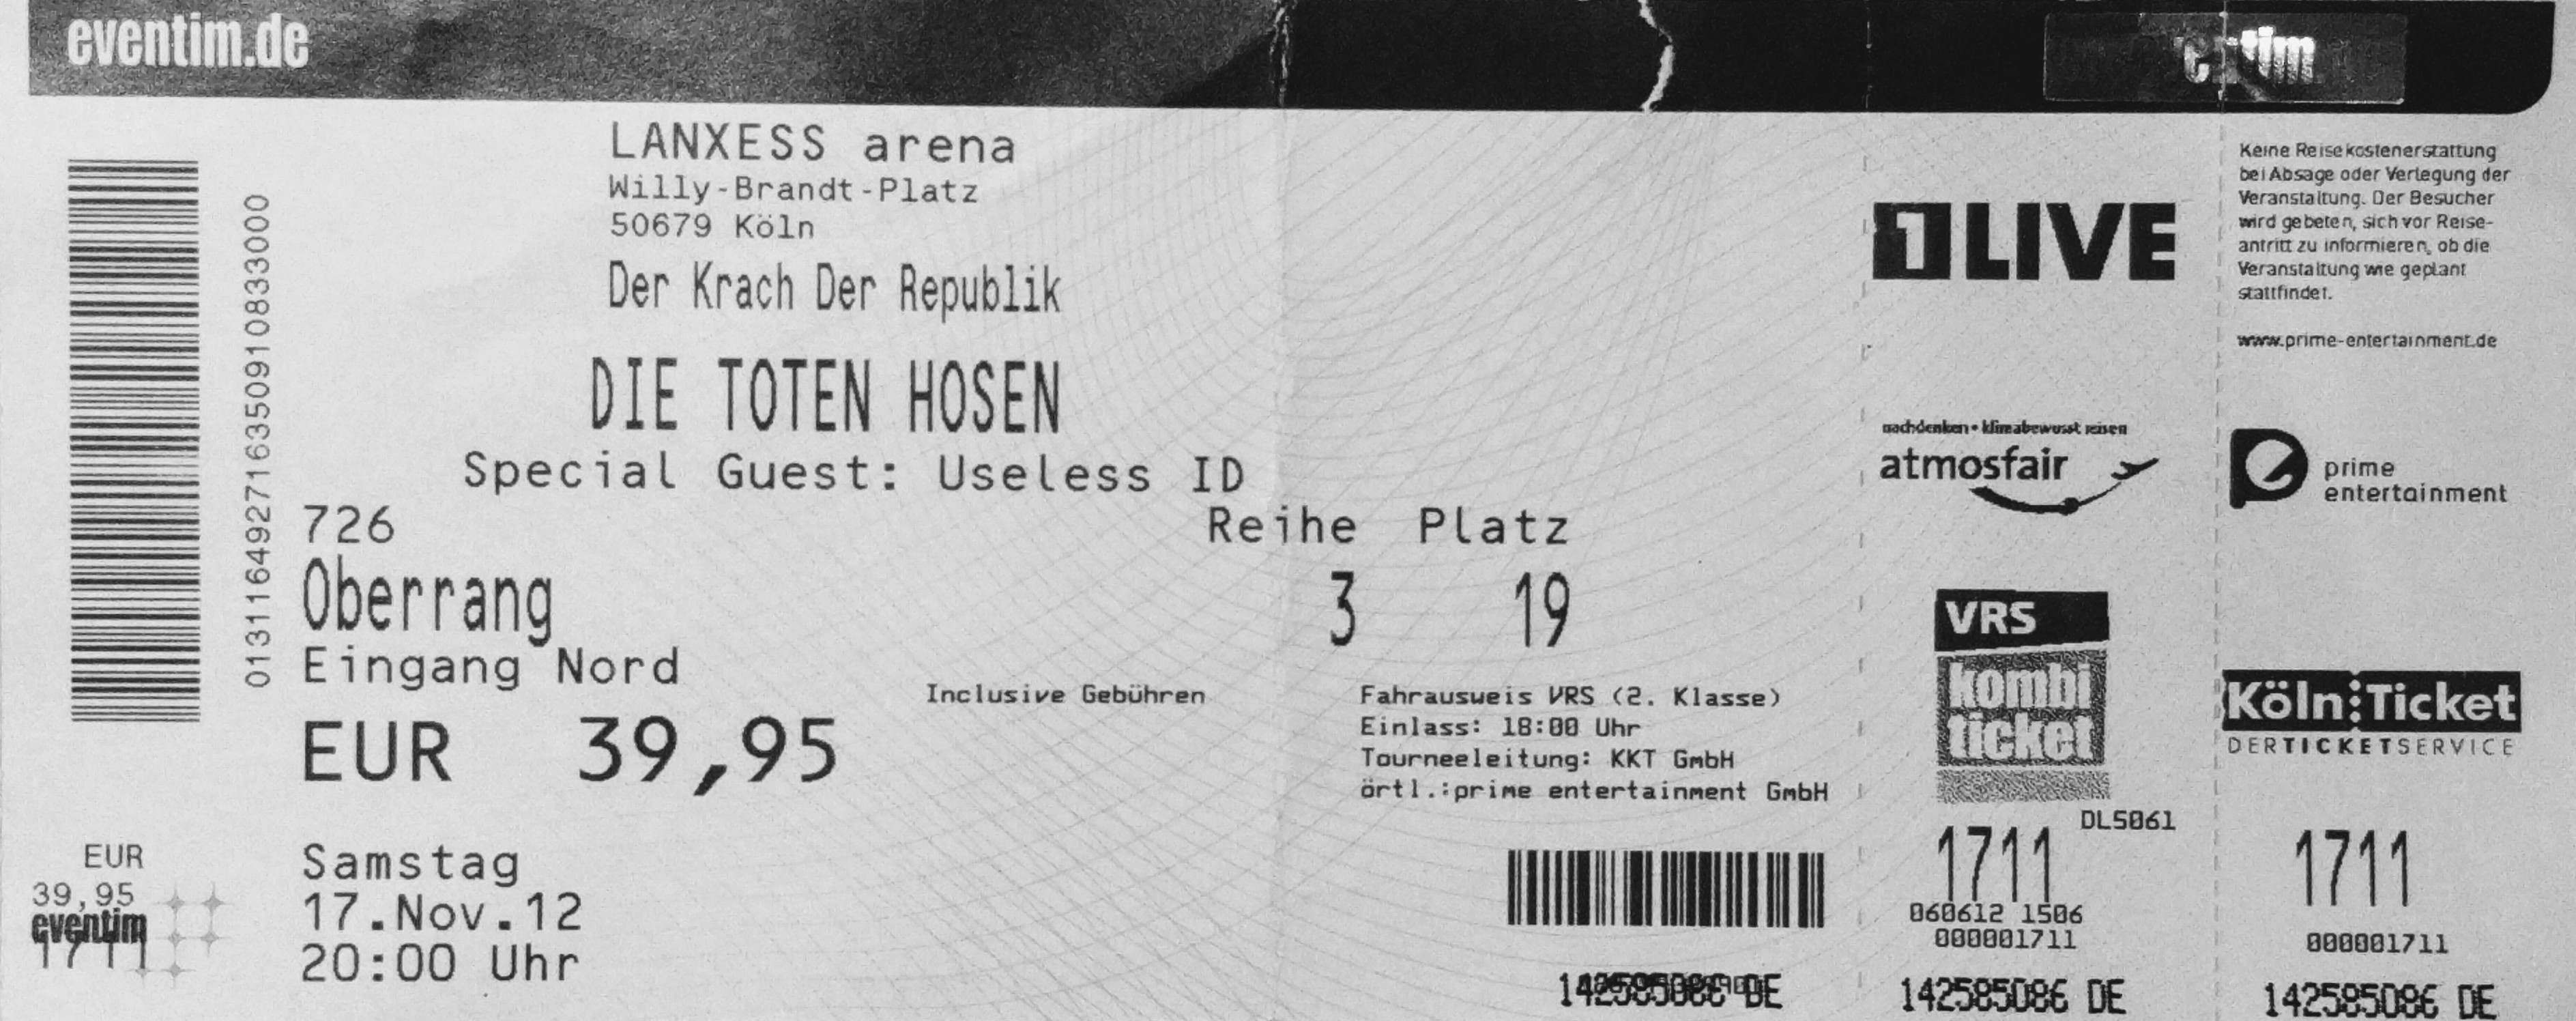 19. November 2012, Köln: Die Toten Hosen